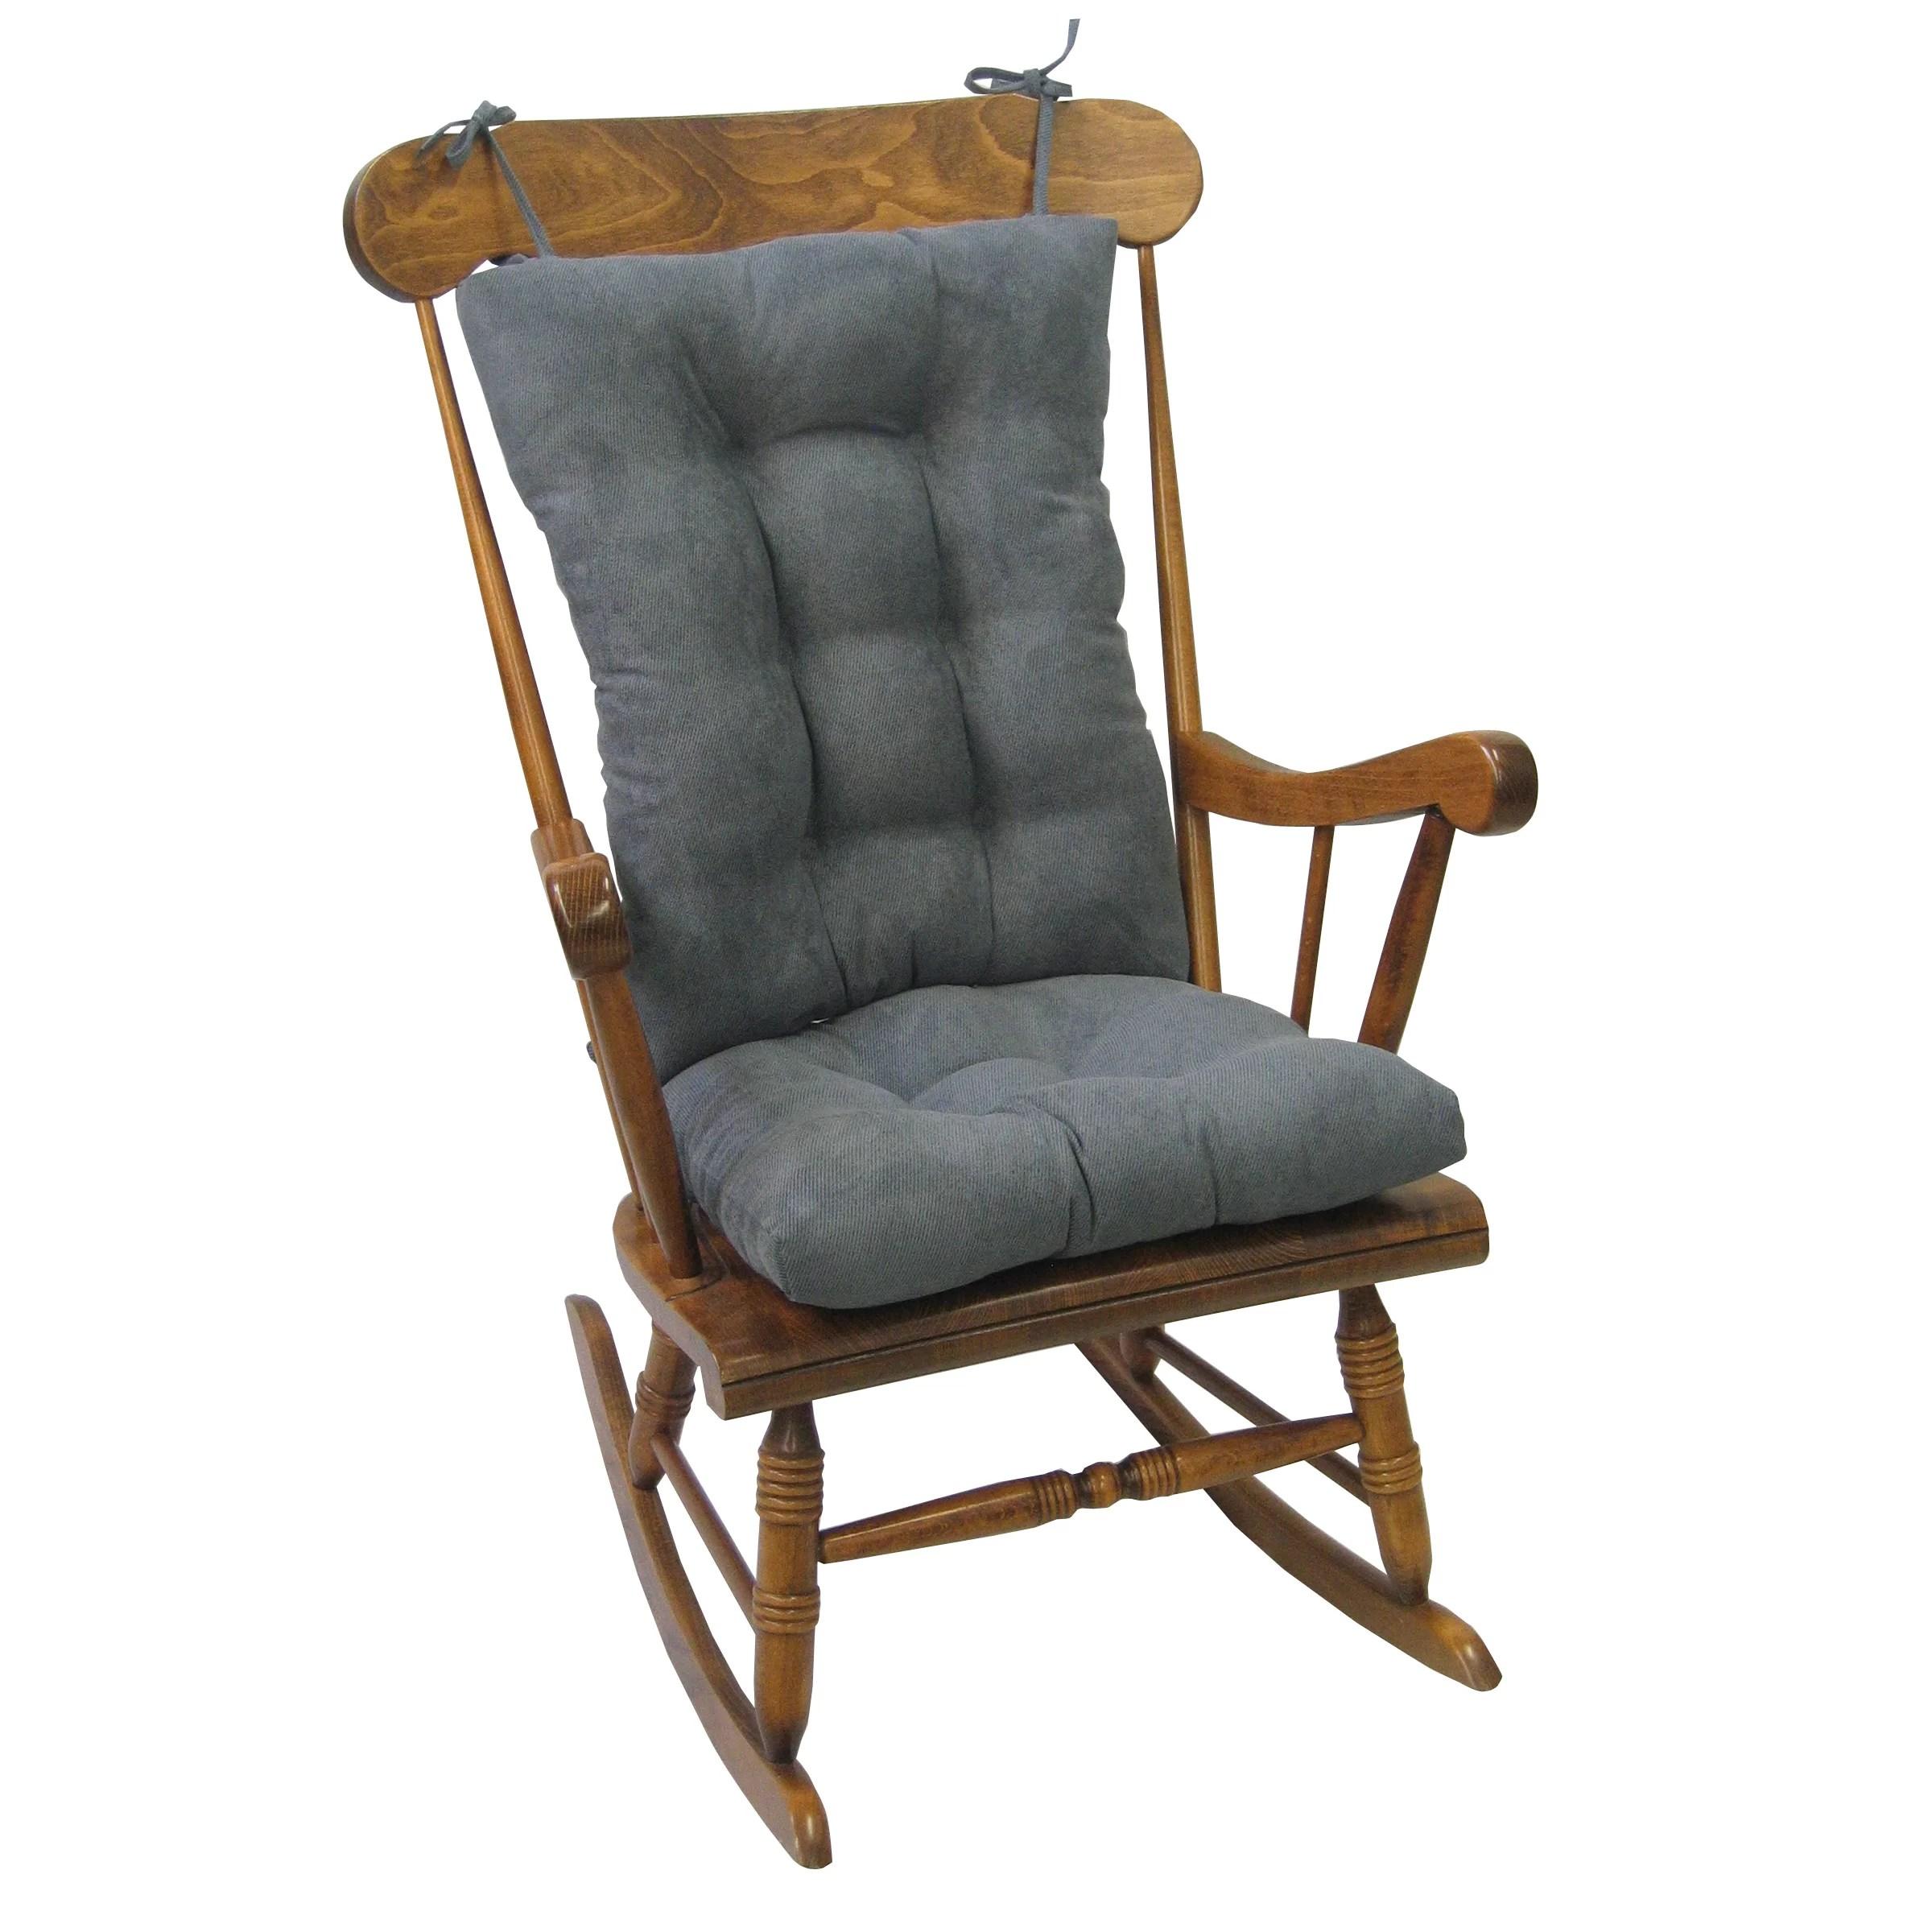 Wayfair Basics Wayfair Basics Rocking Chair Cushion